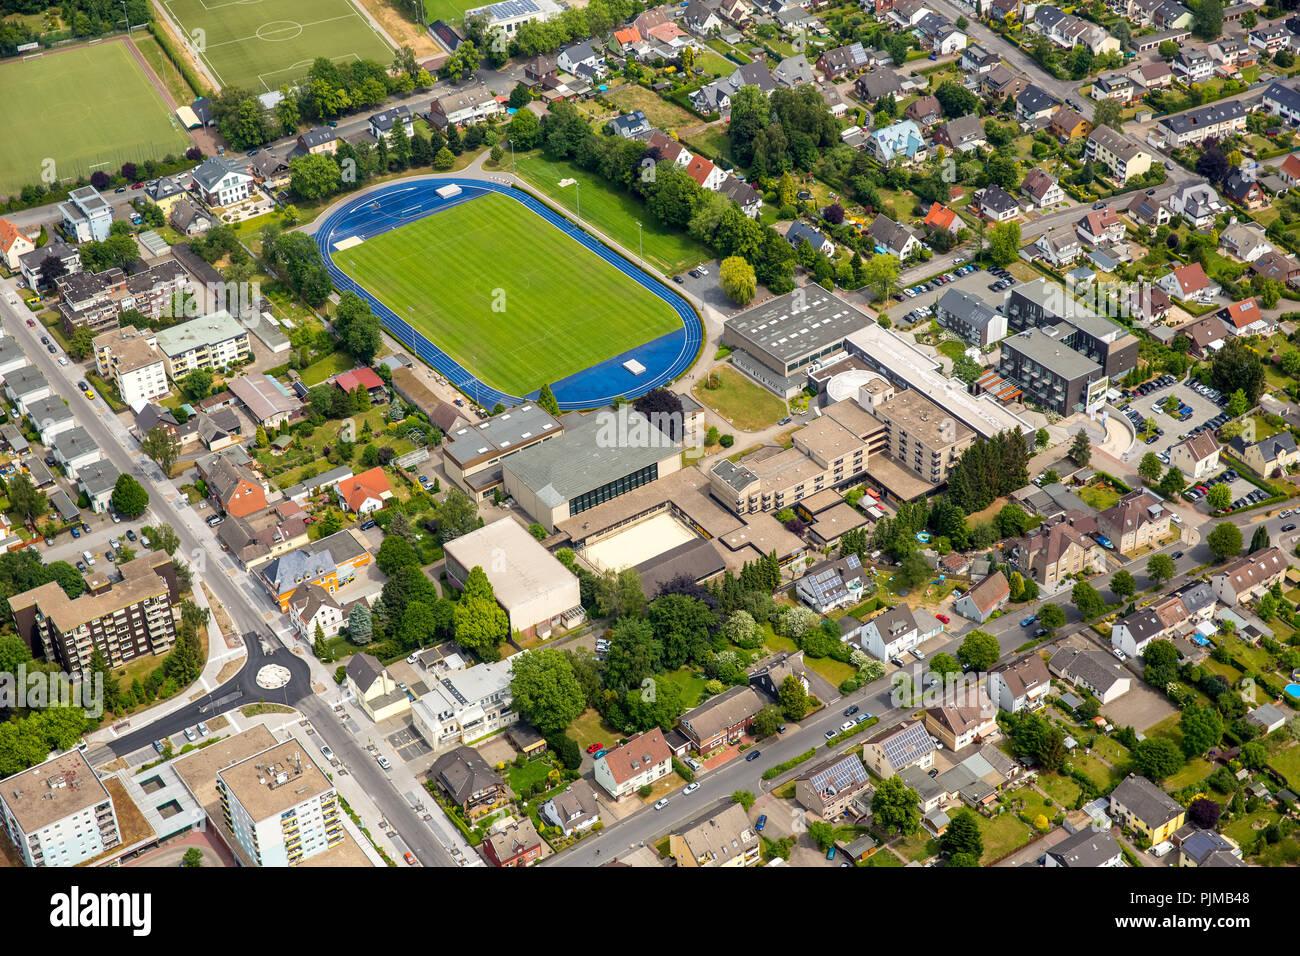 SportCentrum Kaiserau, sports center Kaiserau, performance center, training center for competitive football, Kamen, Ruhr area, North Rhine-Westphalia, Germany - Stock Image